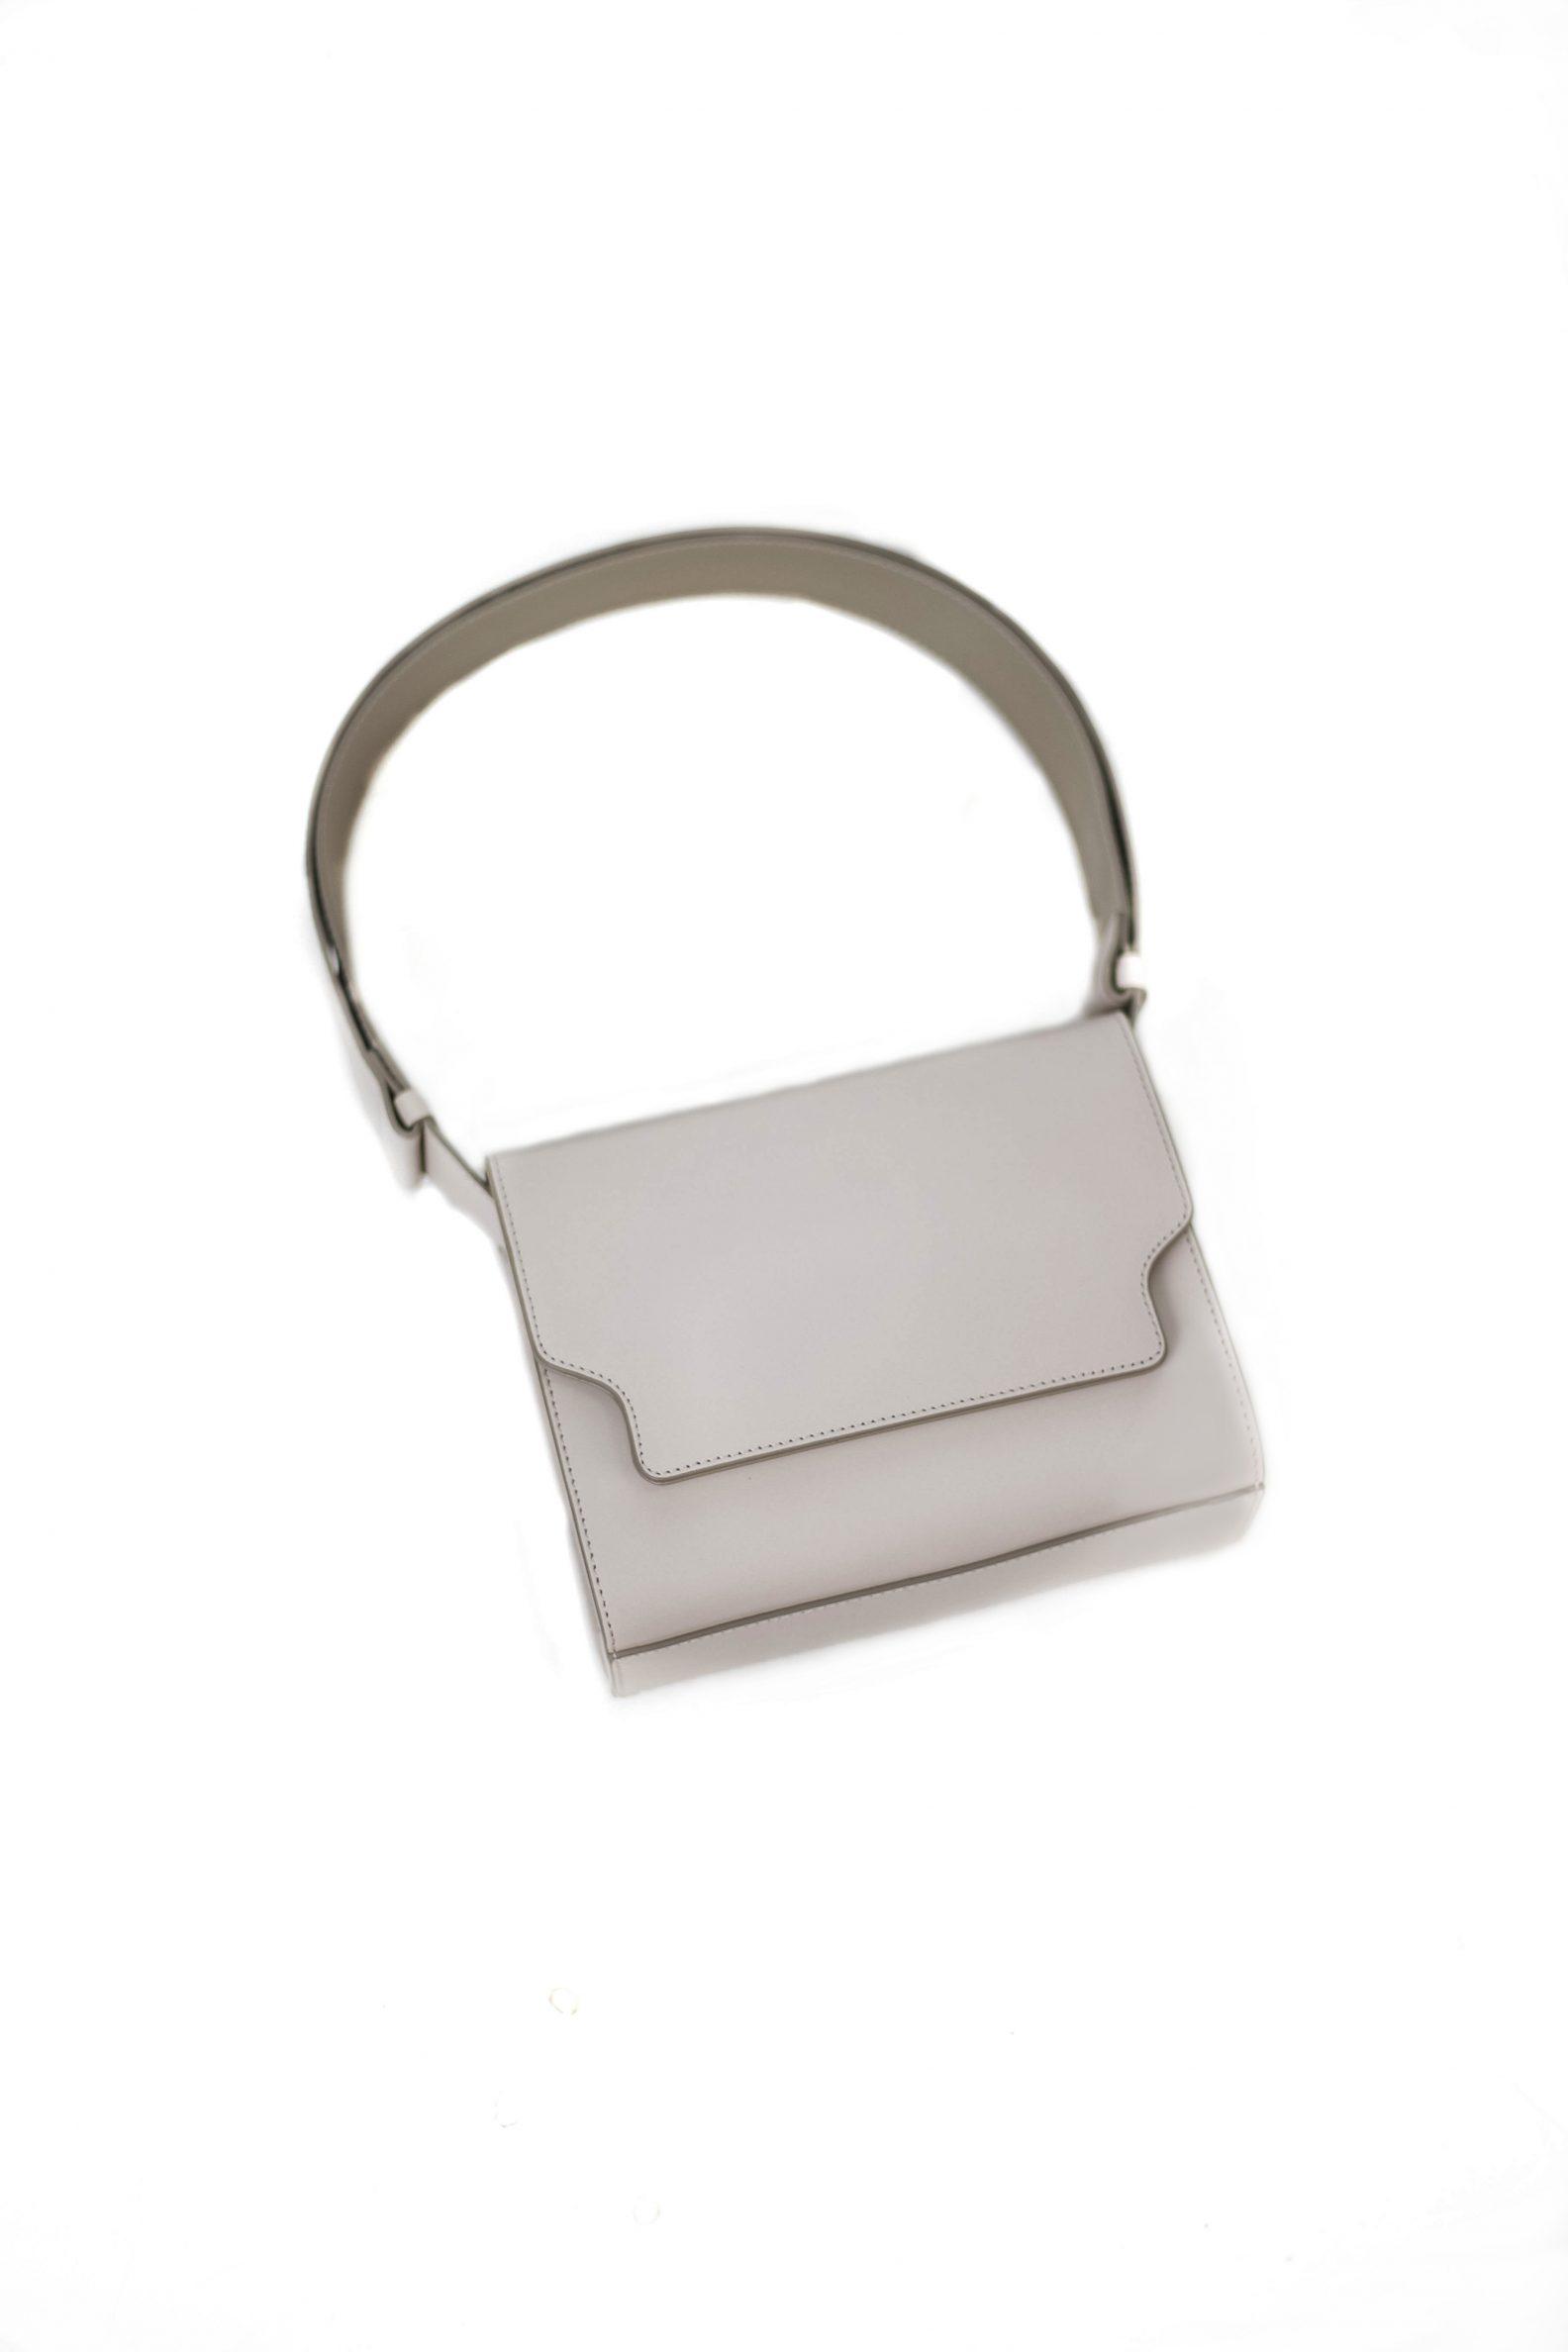 Sac Vava gris clair-Vava bag-1-sac-cuir-rabat-gris-clair-affaires-etrangeres-paris-mode-coreenne-besides-kimchi-jpg